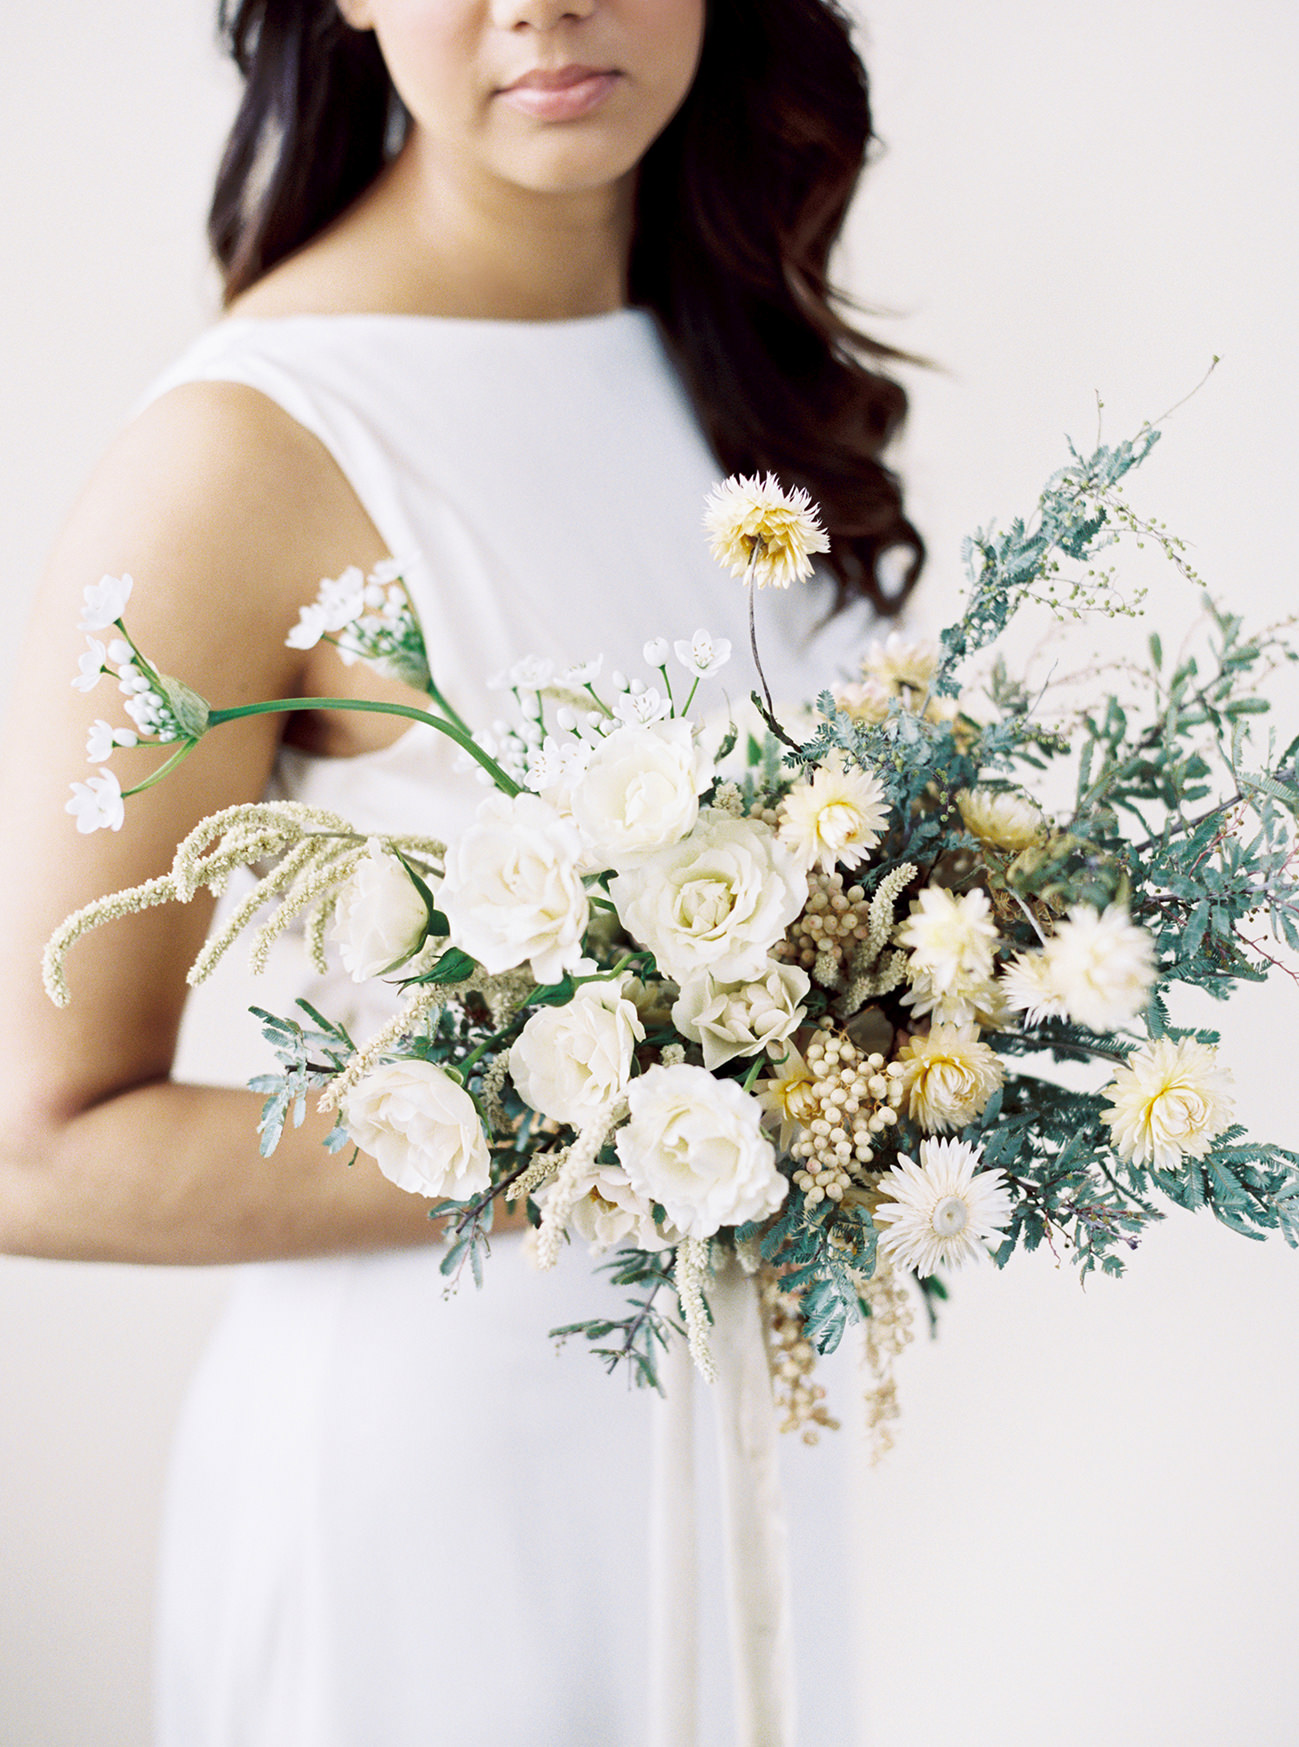 Bridal Inspiration, Wedding Bouquet, Hääkuvaus, Film Wedding Photographer, Table Setting Inspiration, Stationery, Dried Flowers, www.nordandmae.com, www.susannanordvall (1).jpg